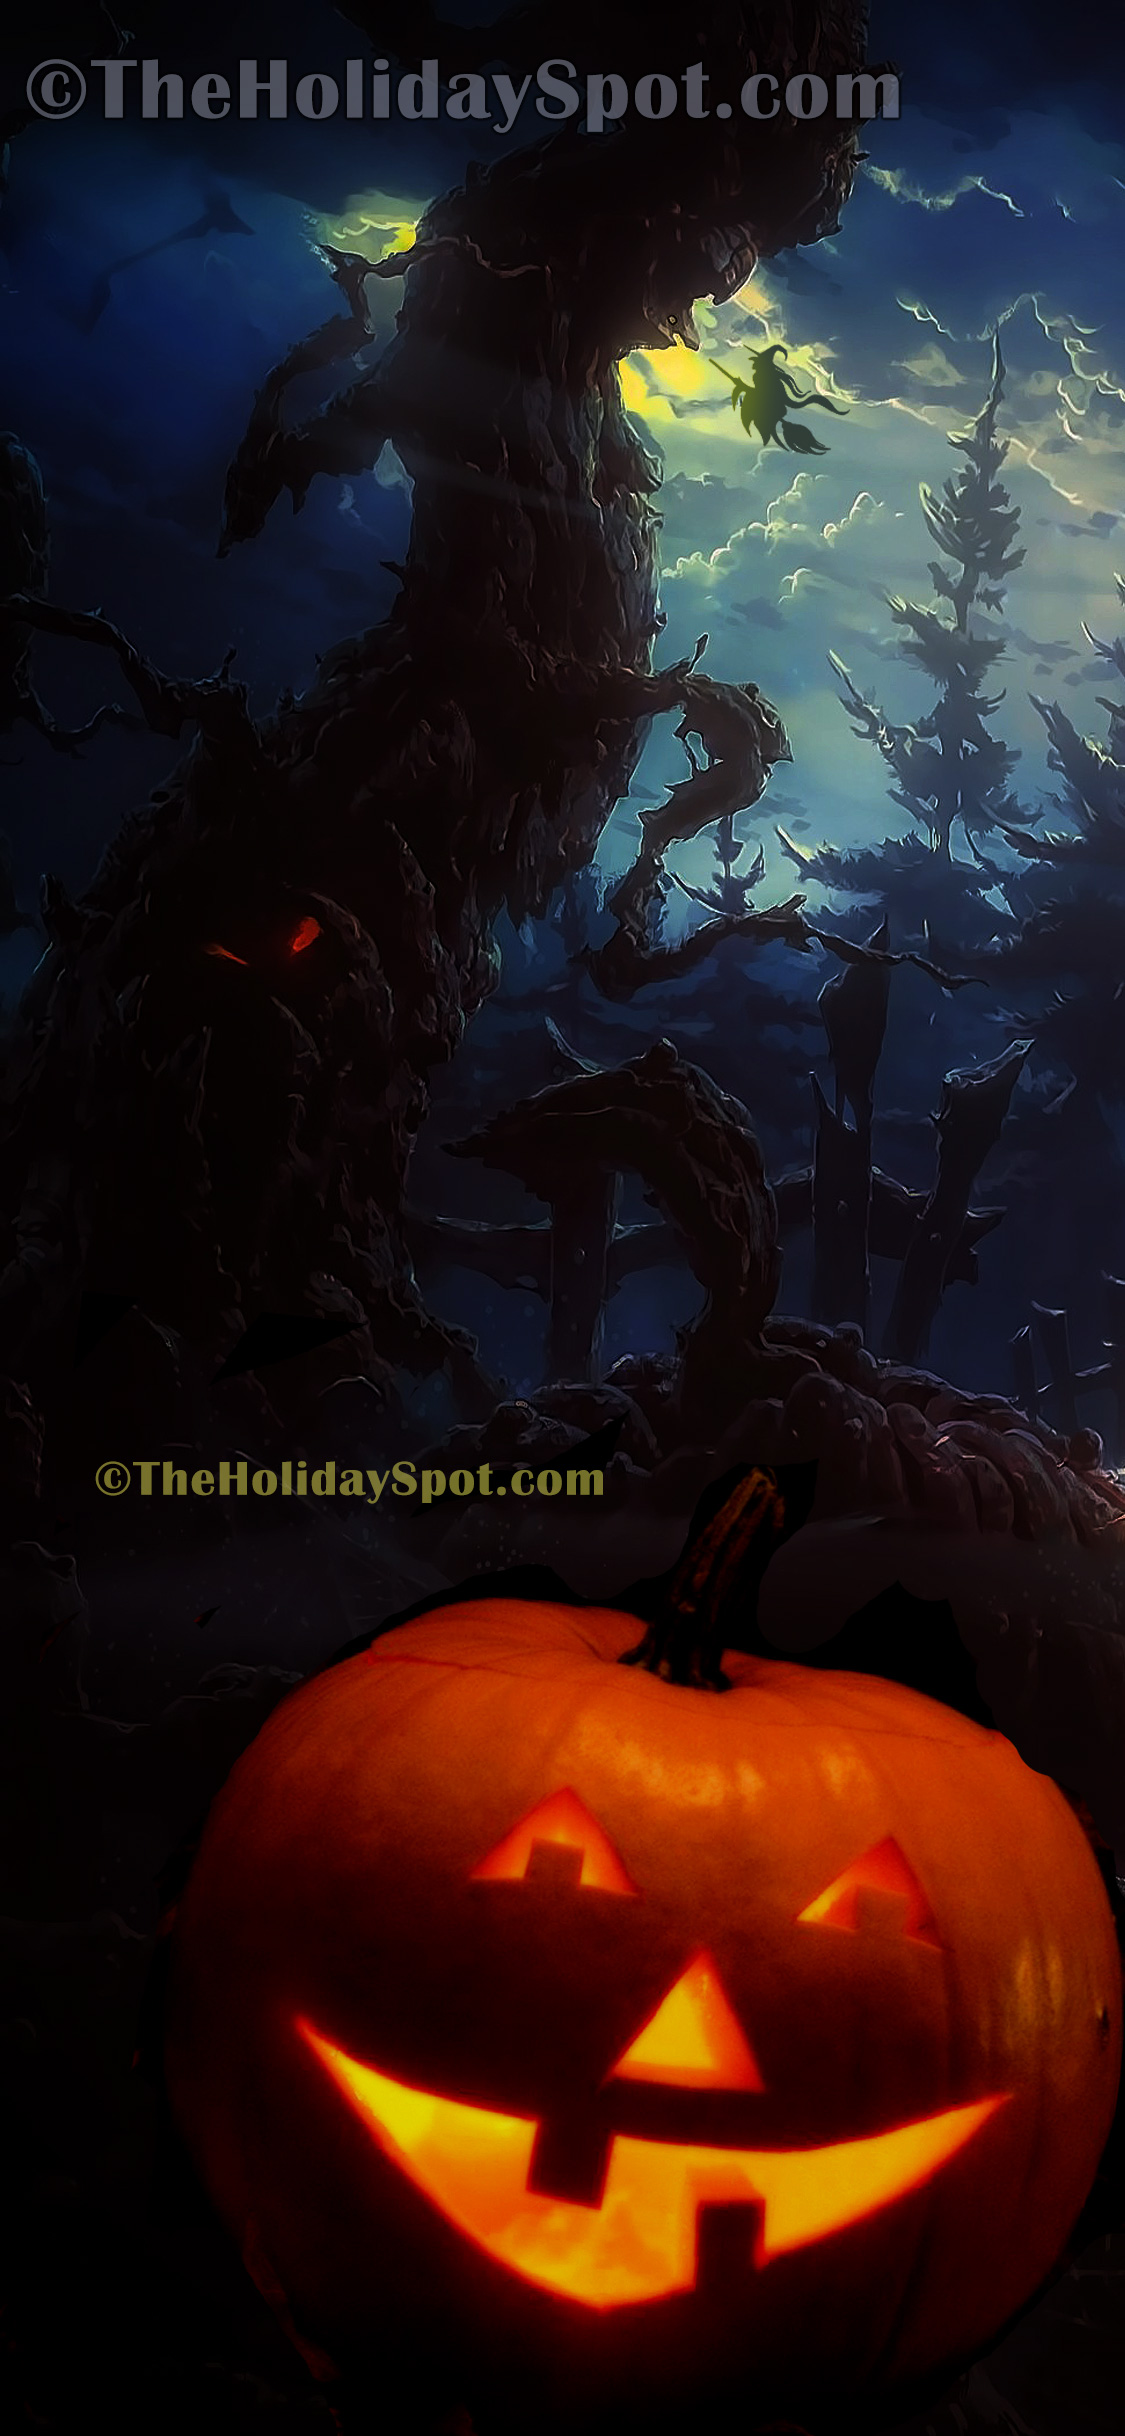 Fantastic Wallpaper Halloween Iphone - iphone-x-1125x2436-06  Snapshot_756135.jpg